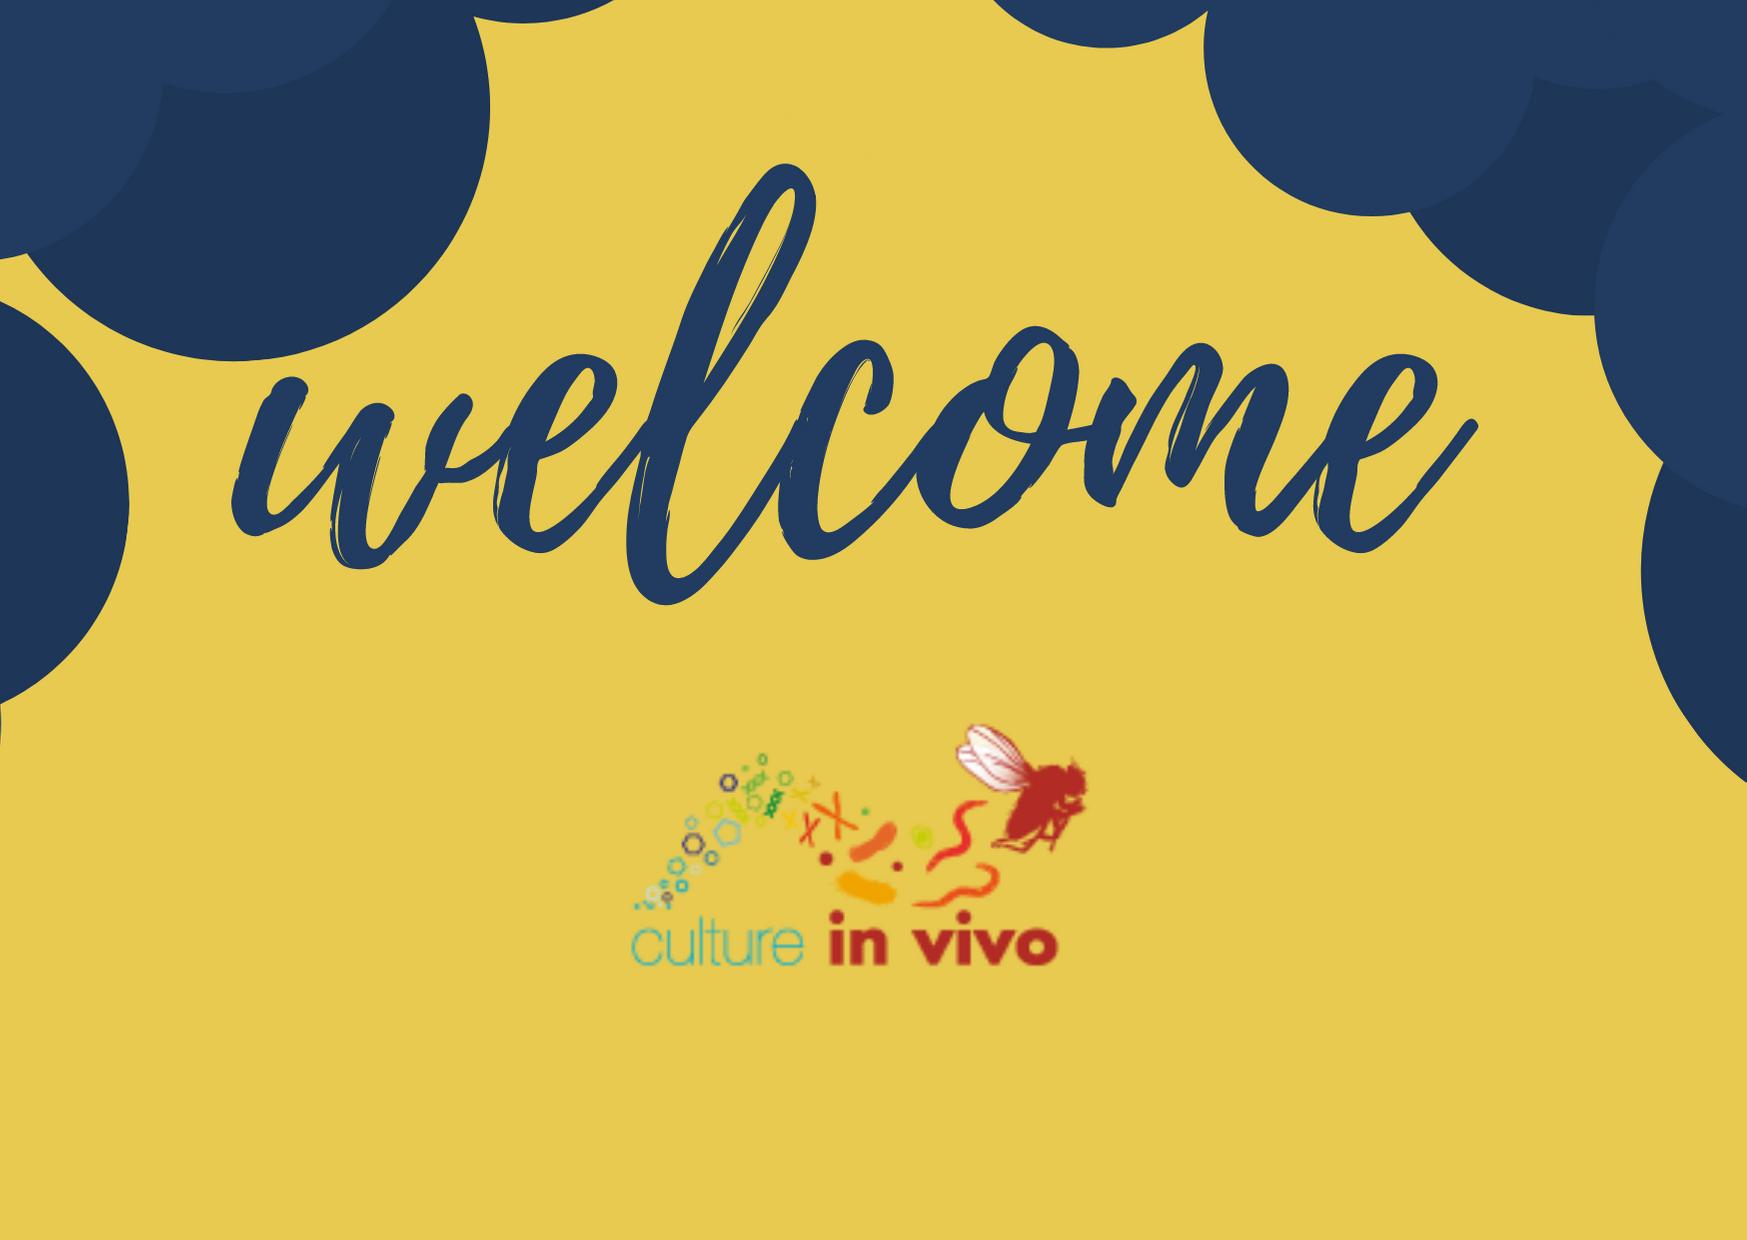 New EVTA Member: Culture in vivo